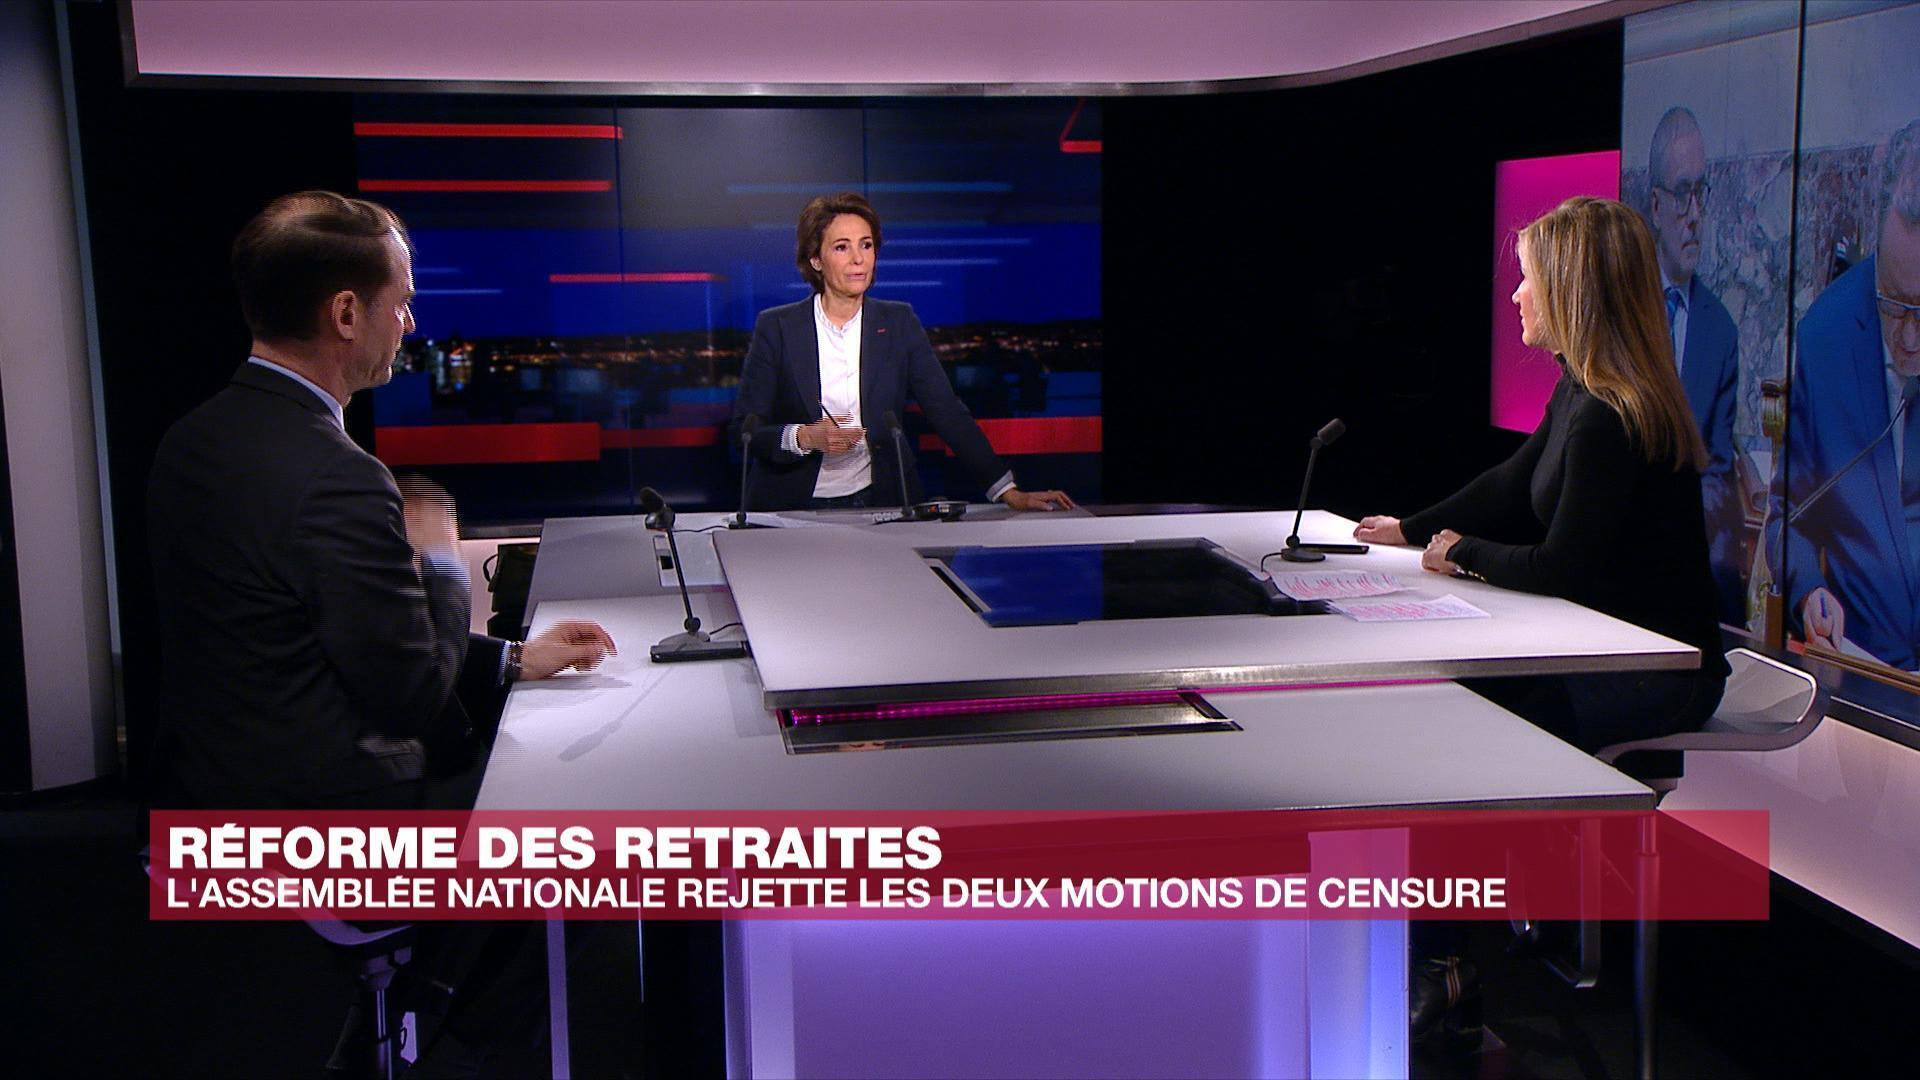 FR NEWS SEMAINE04_03_2020 09_59_30